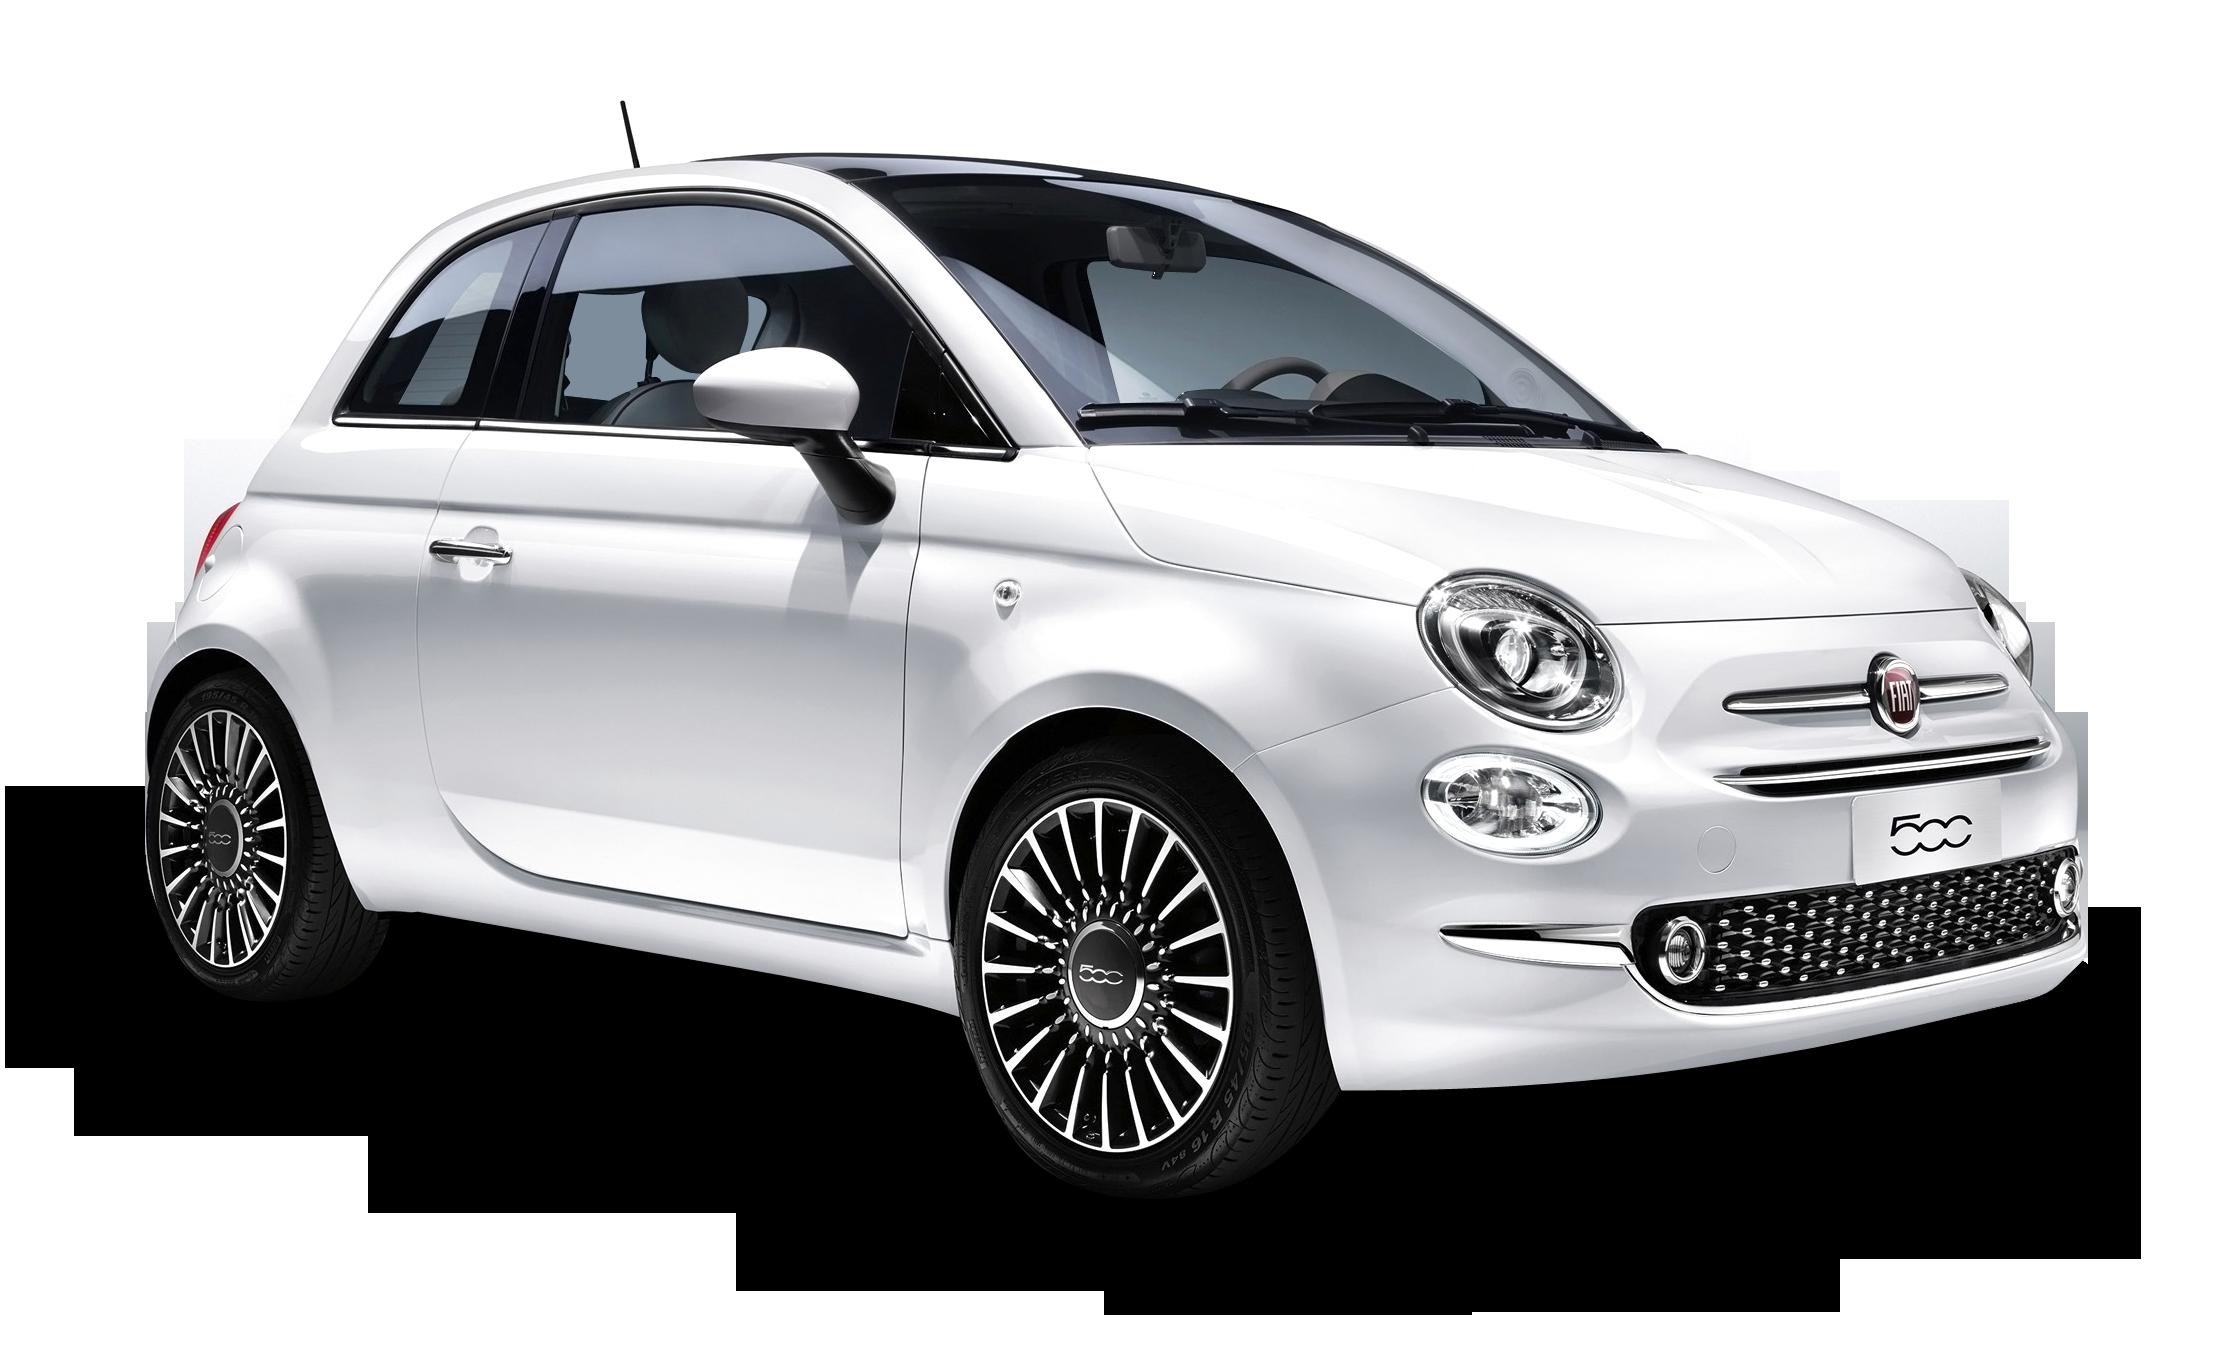 White Fiat 500 Car Png Image Purepng Free Transparent Cc0 Png